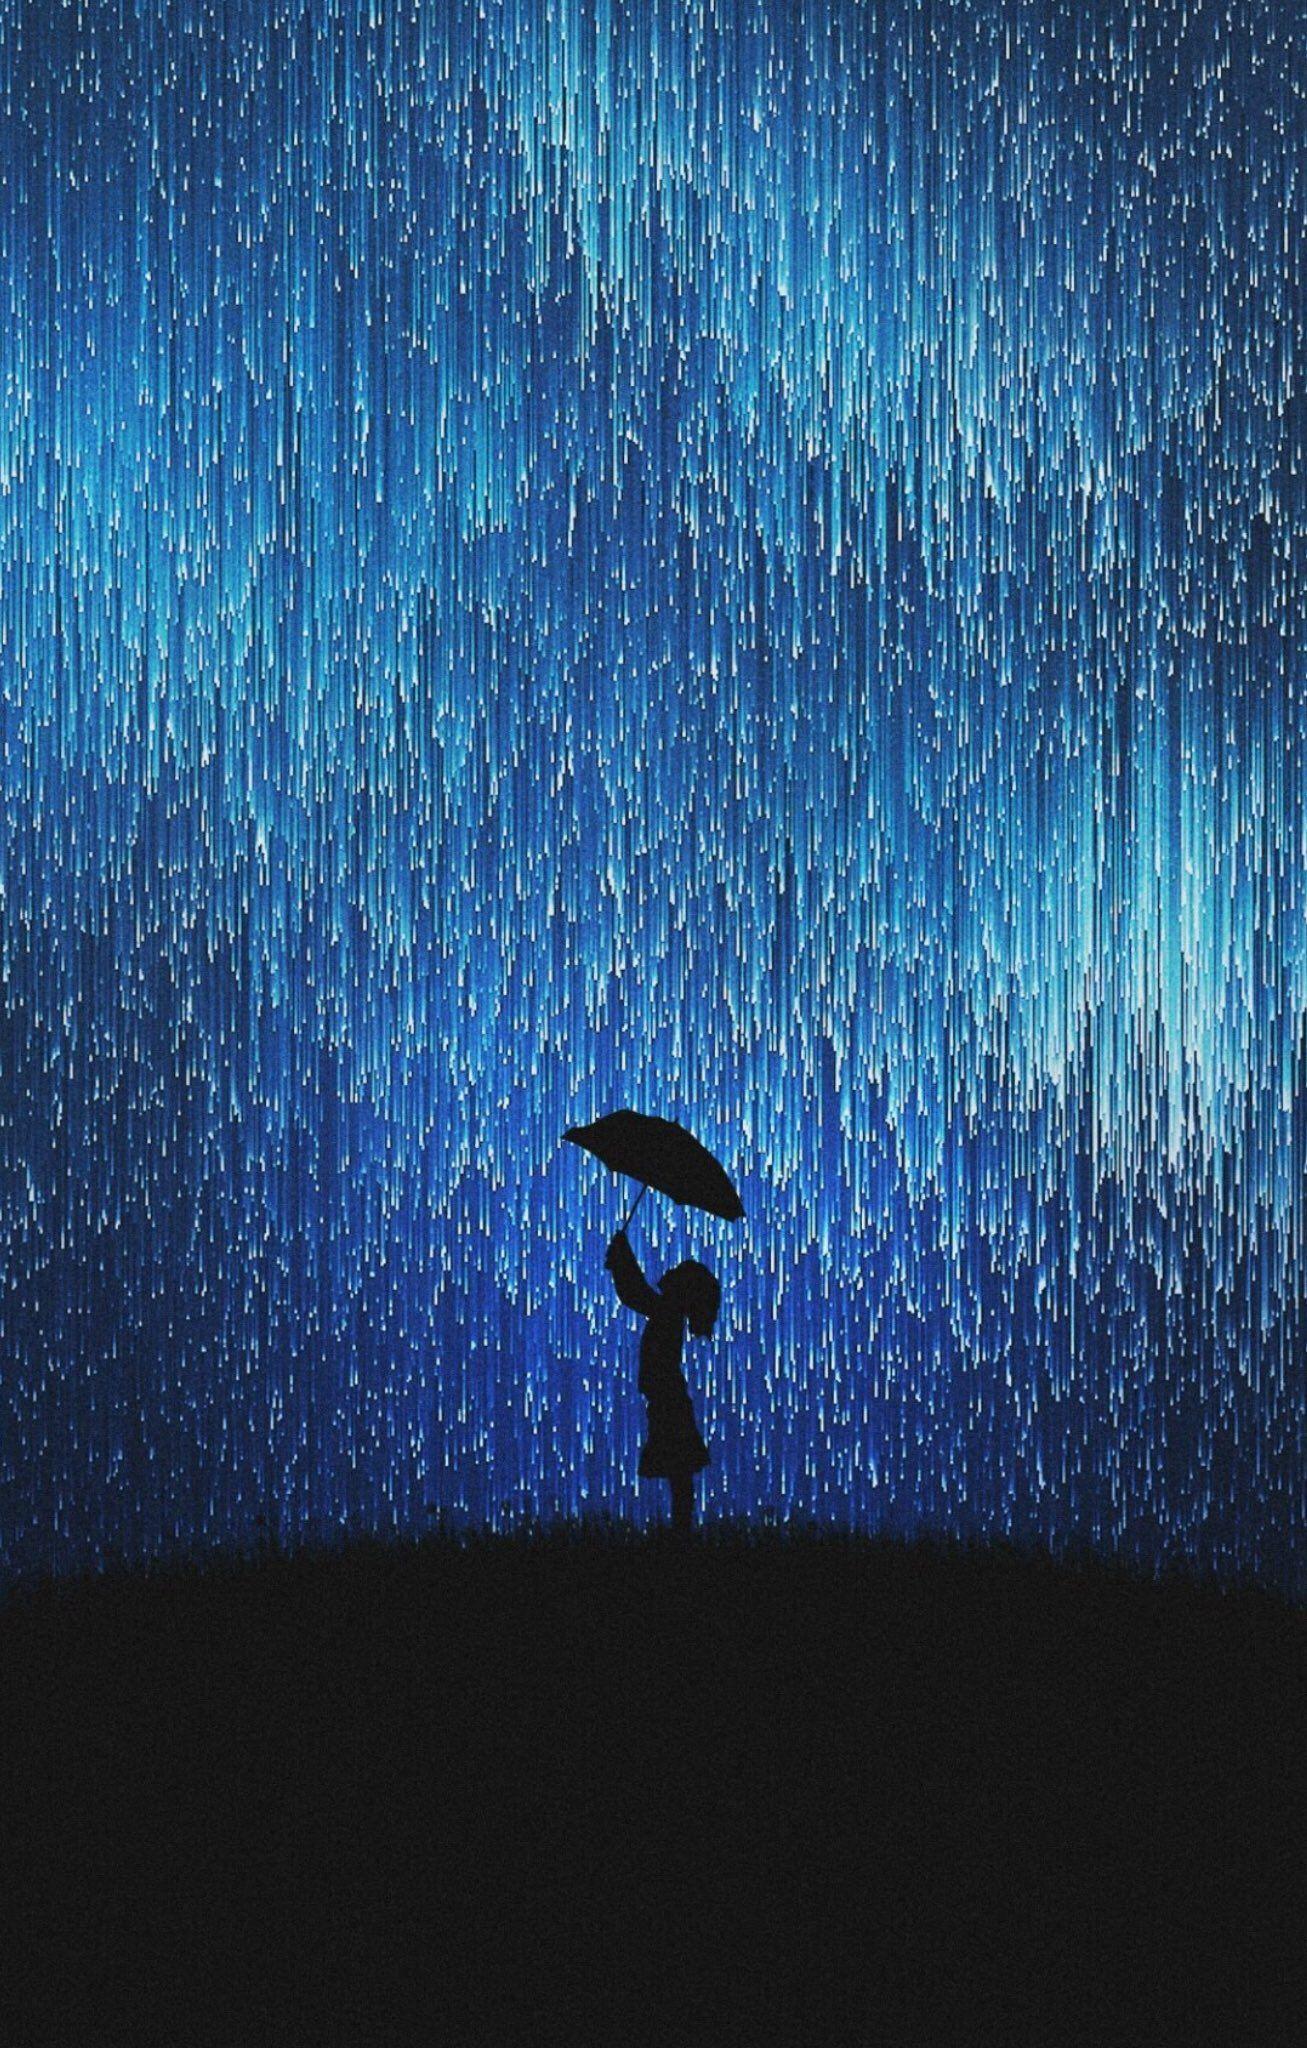 1 𝕮𝖆𝖒𝖎𝖑𝖑𝖆 Blue Saphire5 Twitter Painting Wallpaper Art Rain Wallpapers